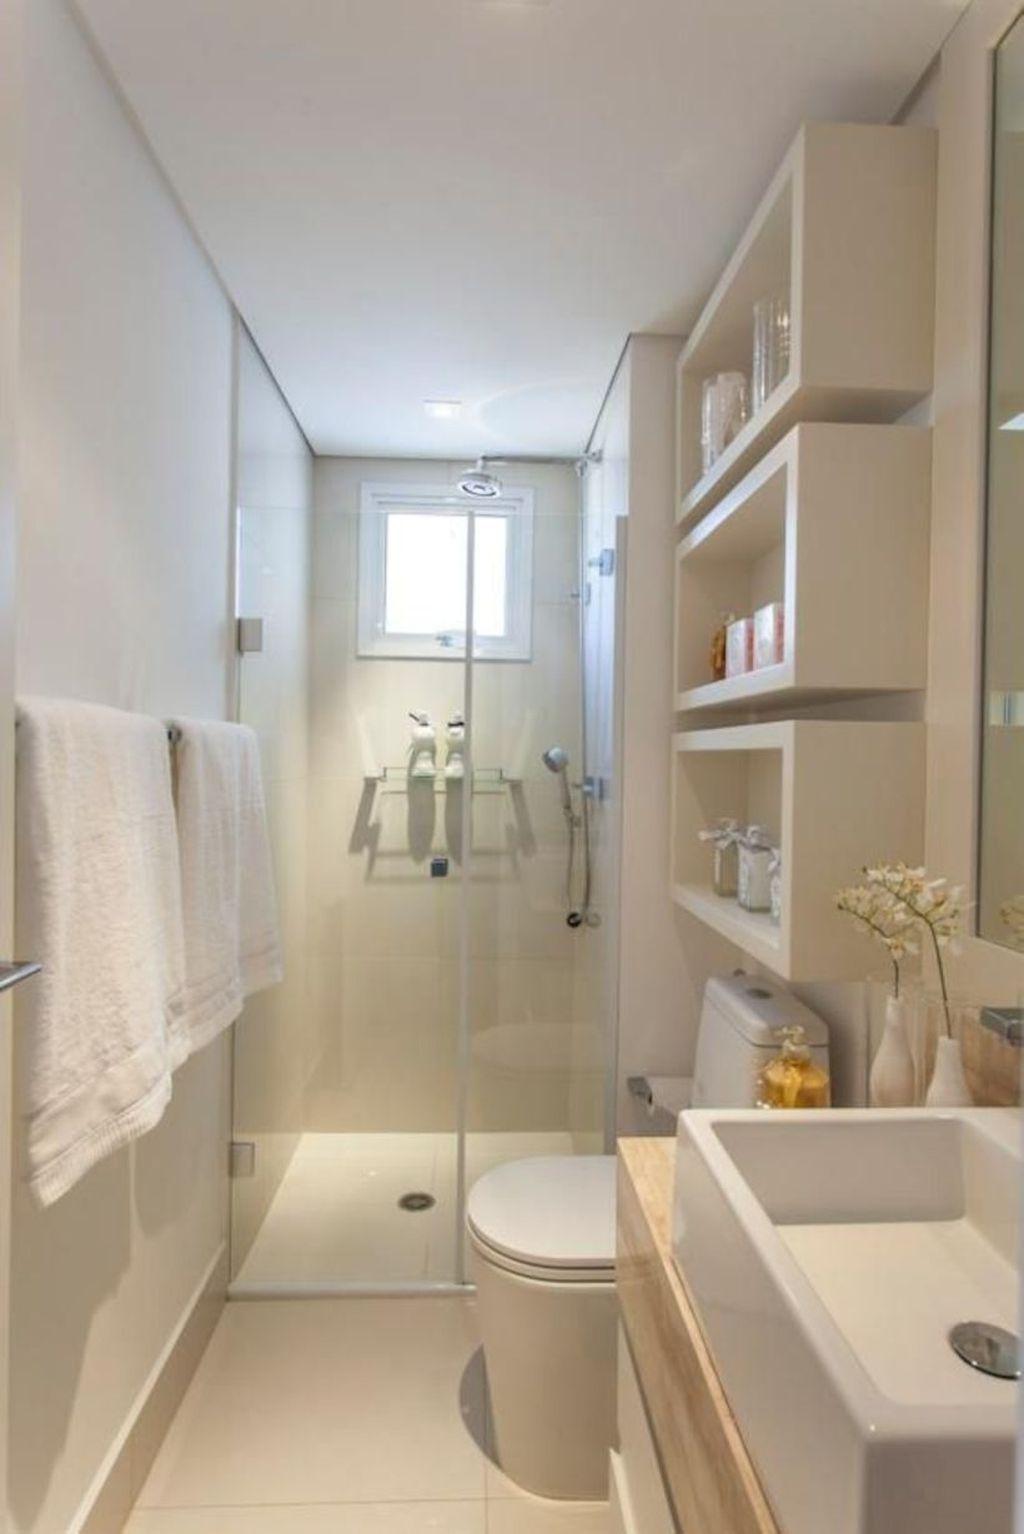 50 Popular Bathroom Ideas On A Budget Small Bathroom Remodel Small Master Bathroom Bathroom Remodel Master